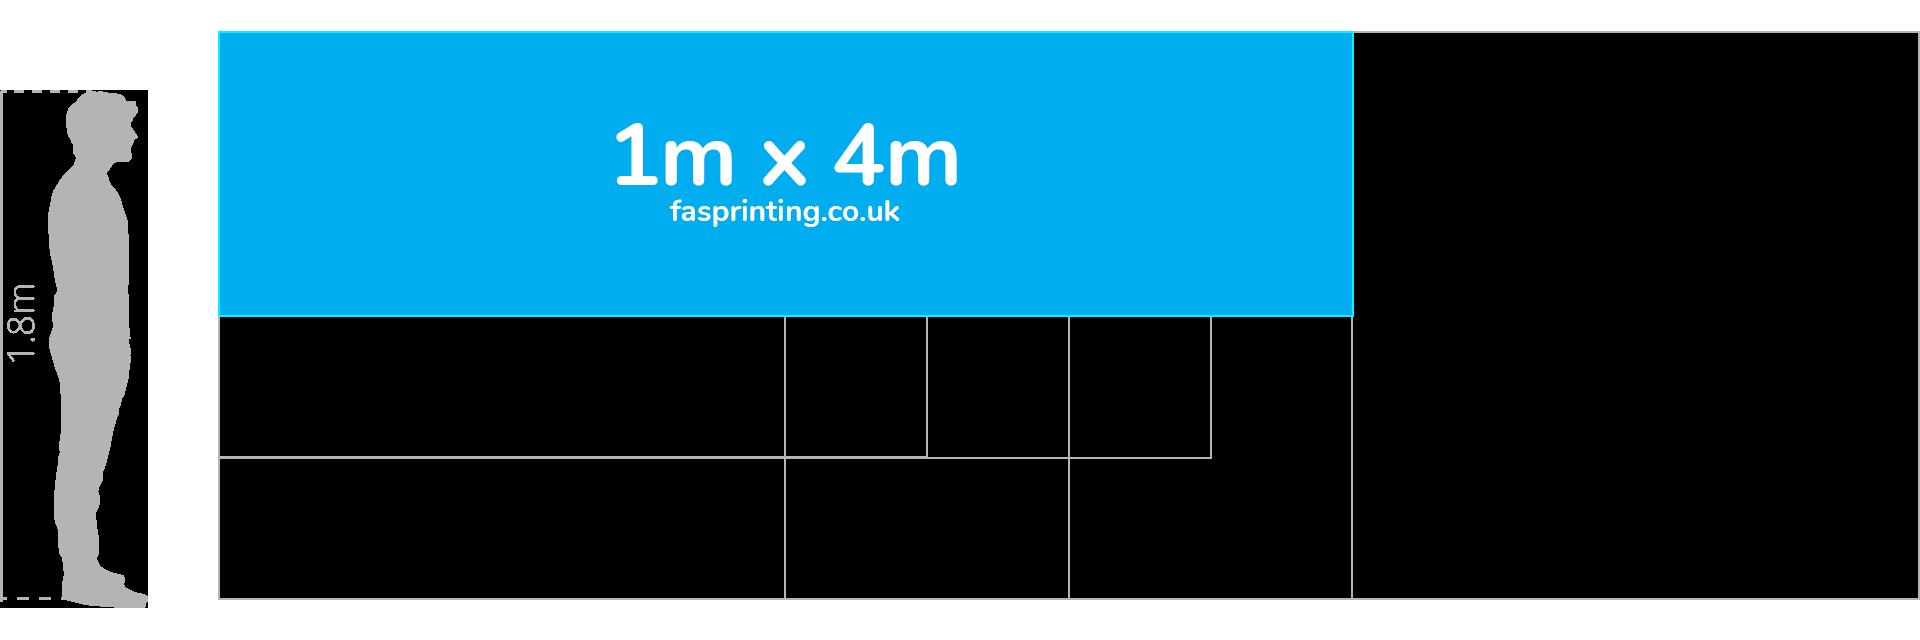 1m x 4m Banner